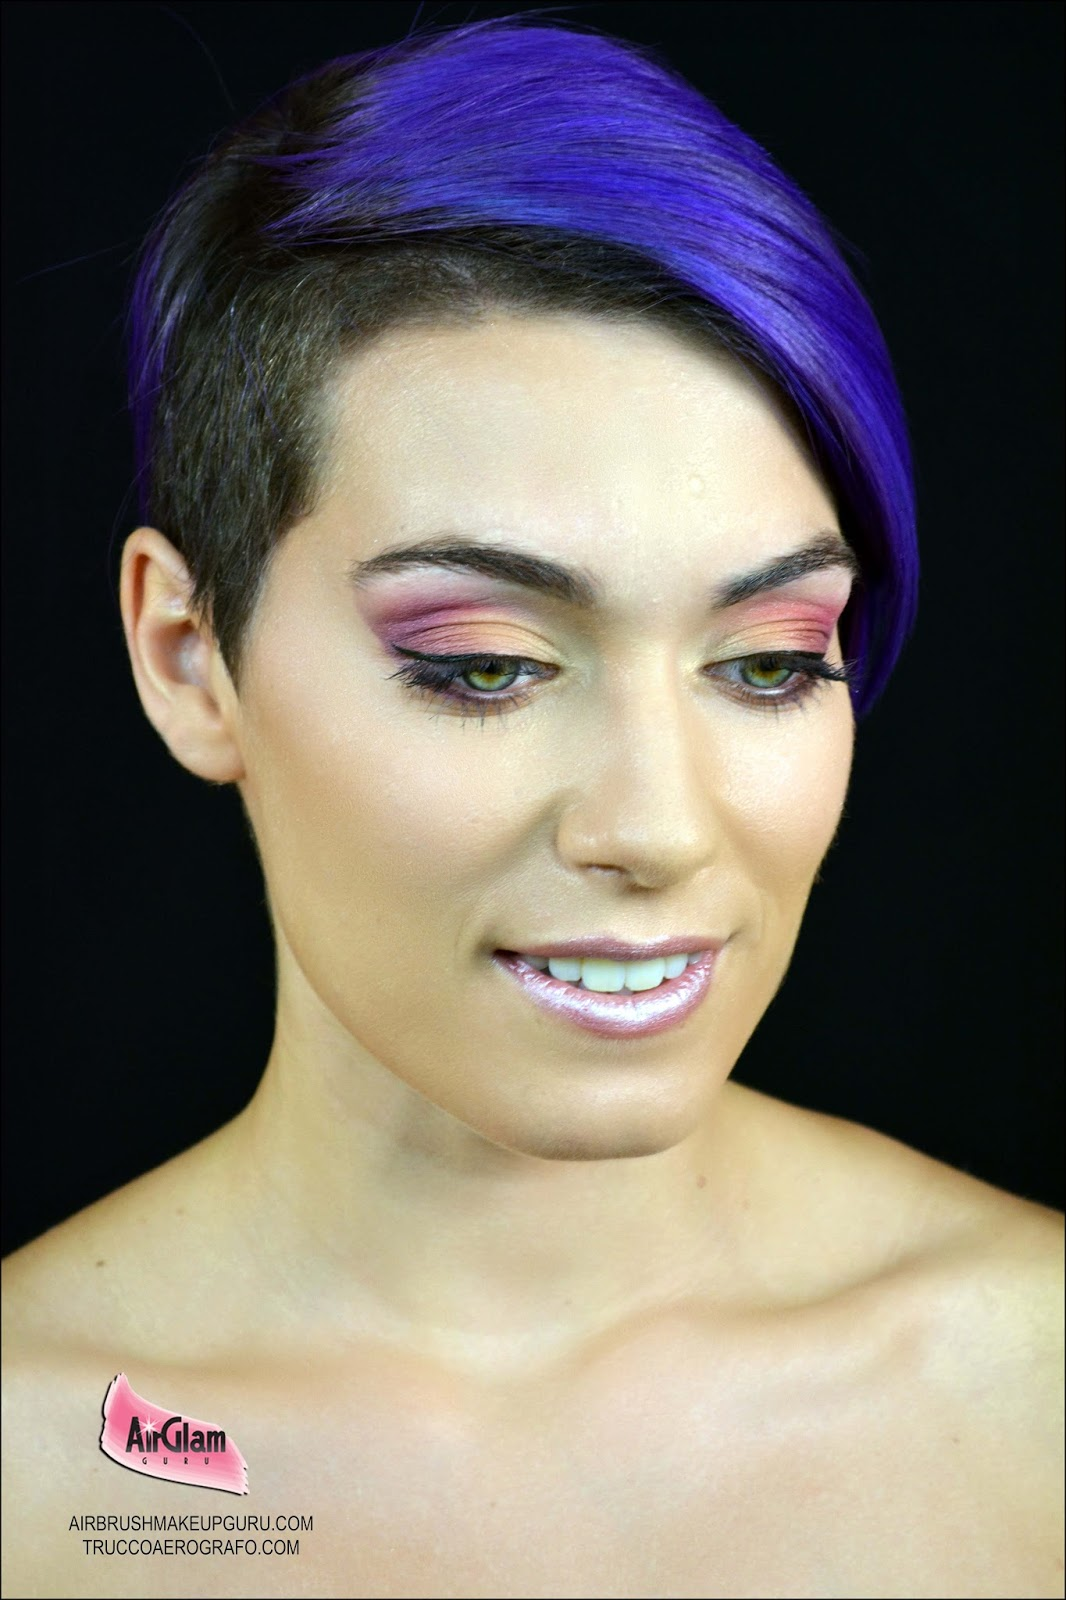 Makeup Gurus On Youtube: The Airbrush Makeup Guru: Easy And Fast Airbrush Makeup